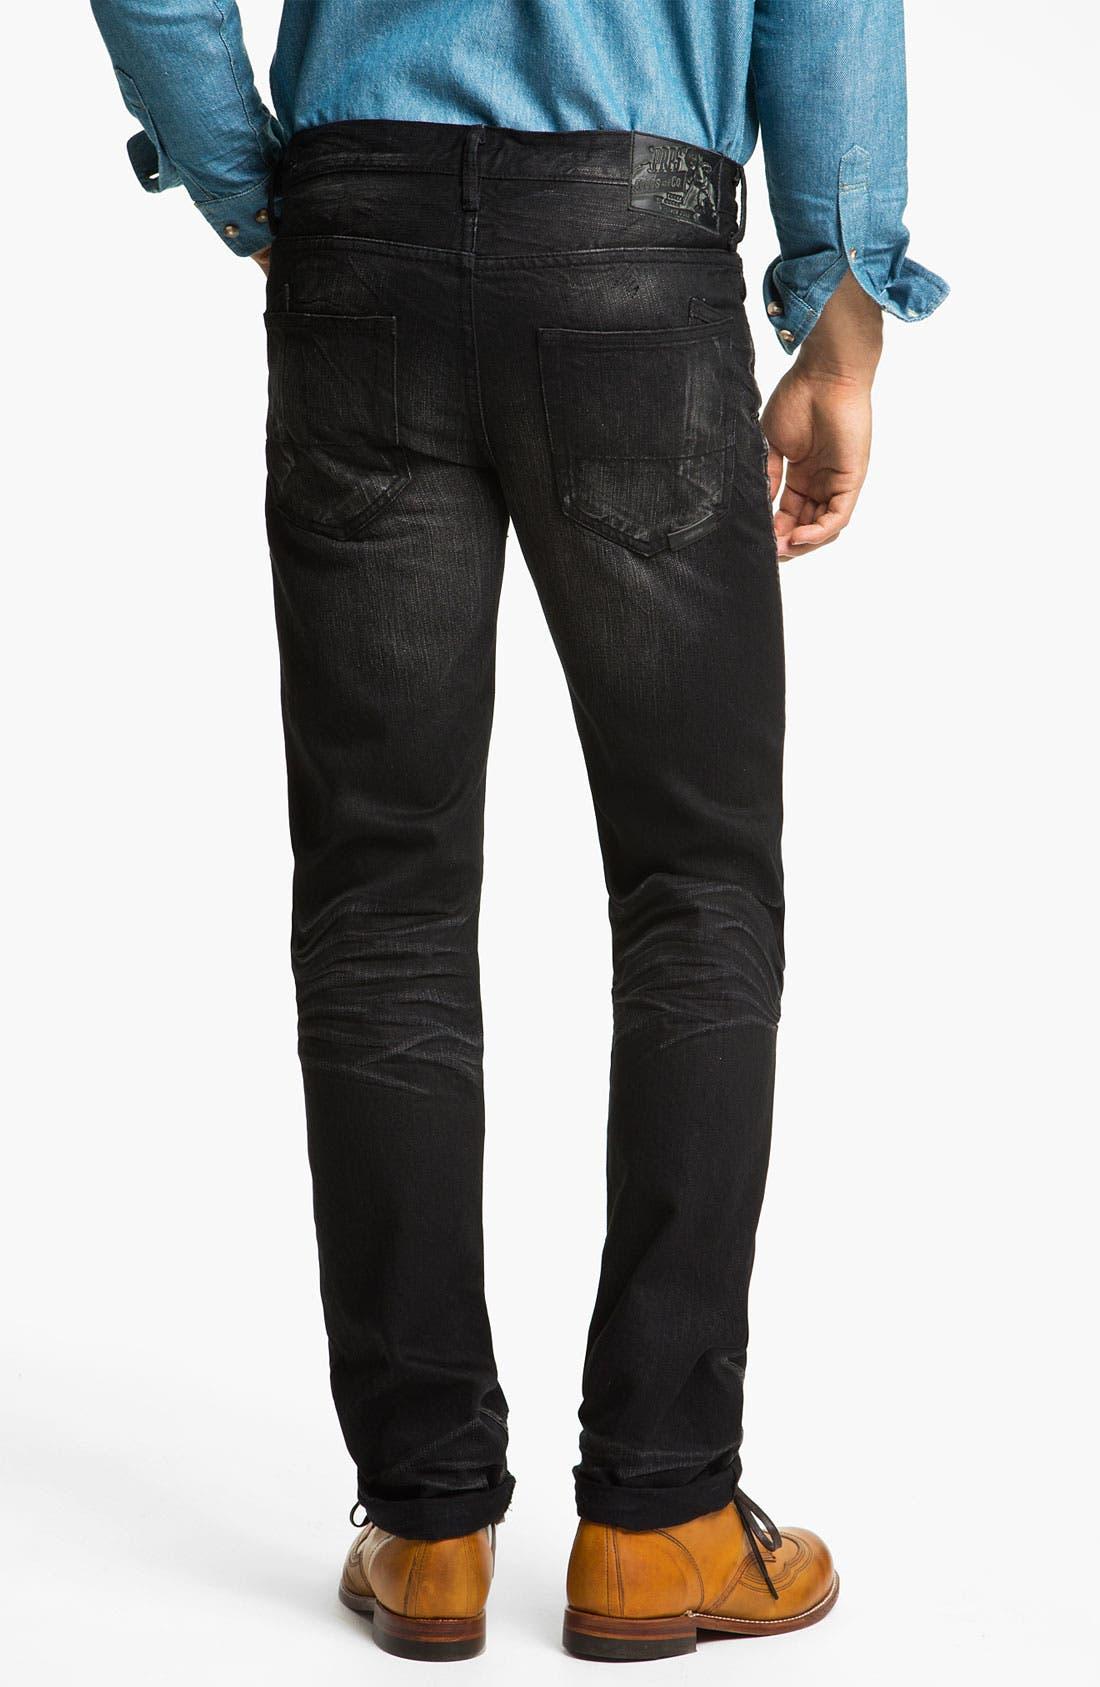 Alternate Image 1 Selected - PRPS 'Rambler' Slim Fit Jeans (Junko's Summit)